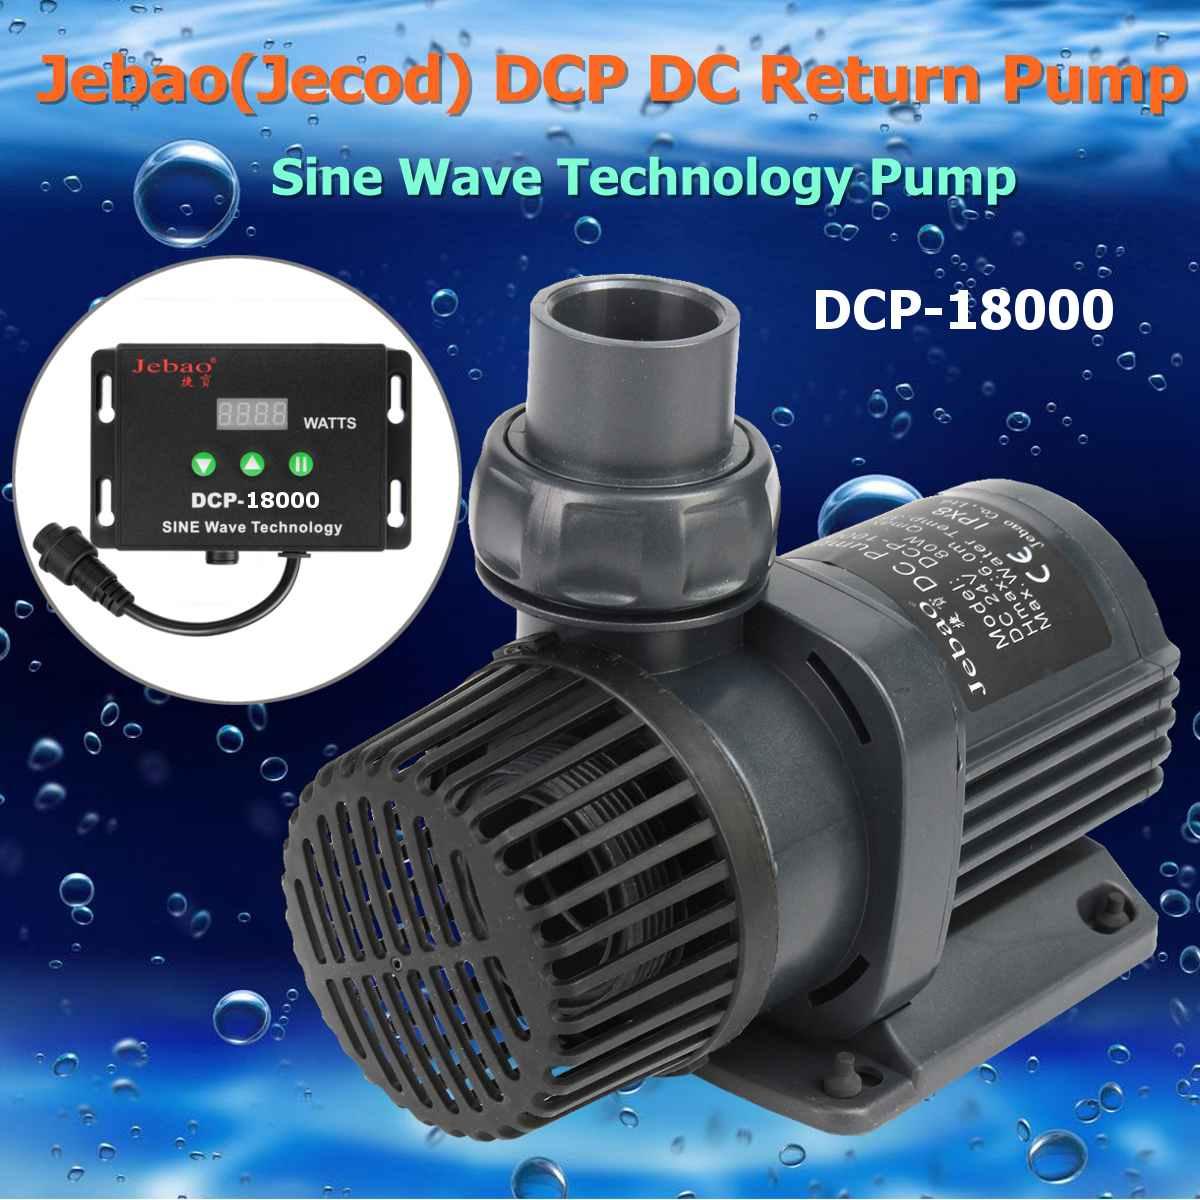 Jebao/jecod dcp série 3500-20000 maring taxa de fluxo dc onda senoidal retorno bomba de água submersível